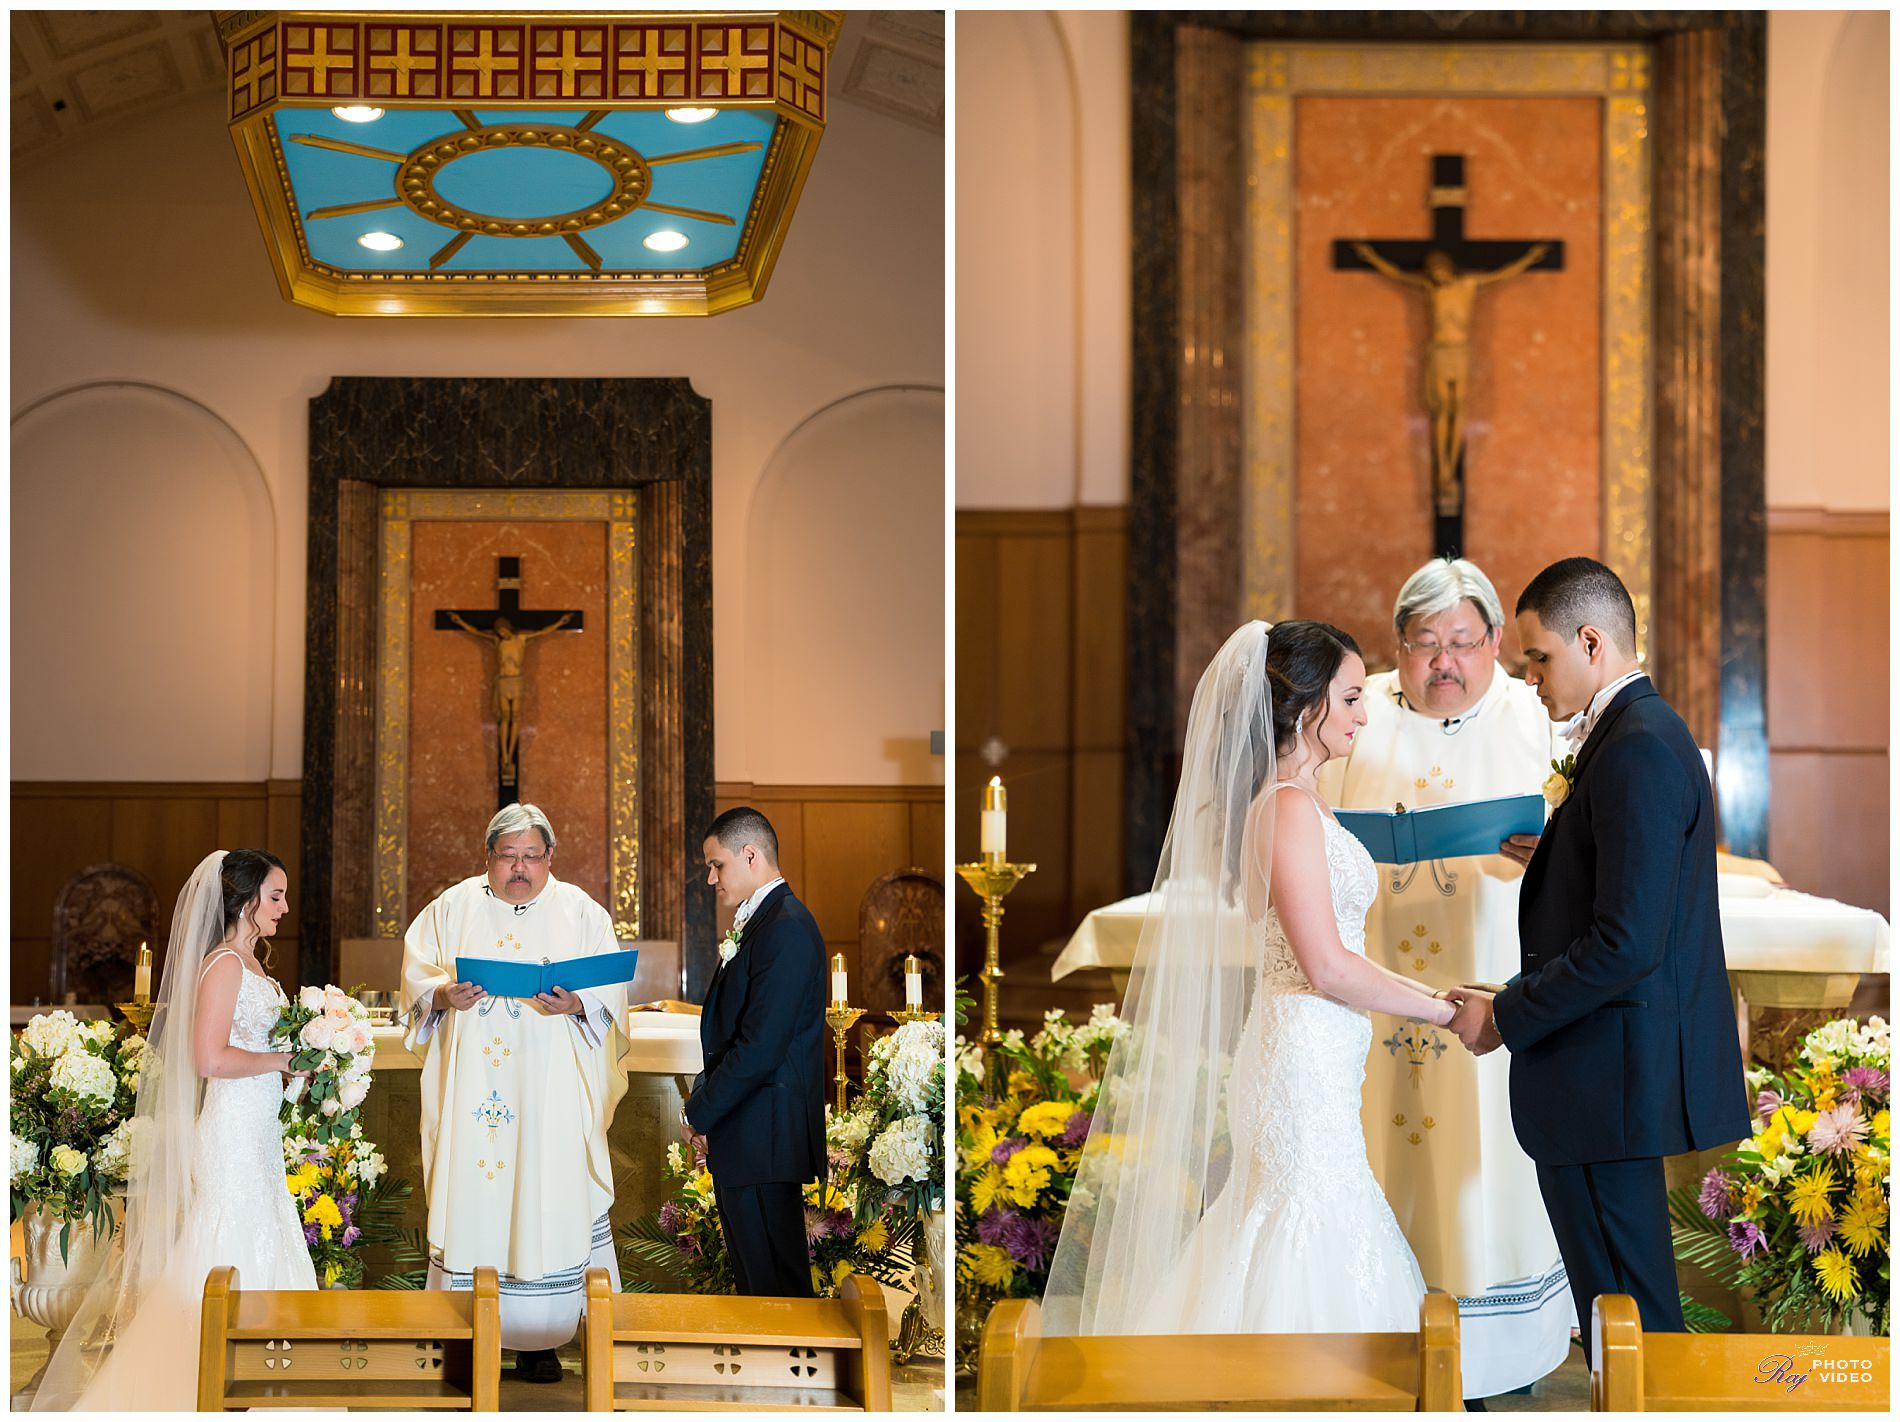 St-Valentines-Catholic-Church-Bloomfield-NJ-Wedding-Yanet-Jose-9.jpg